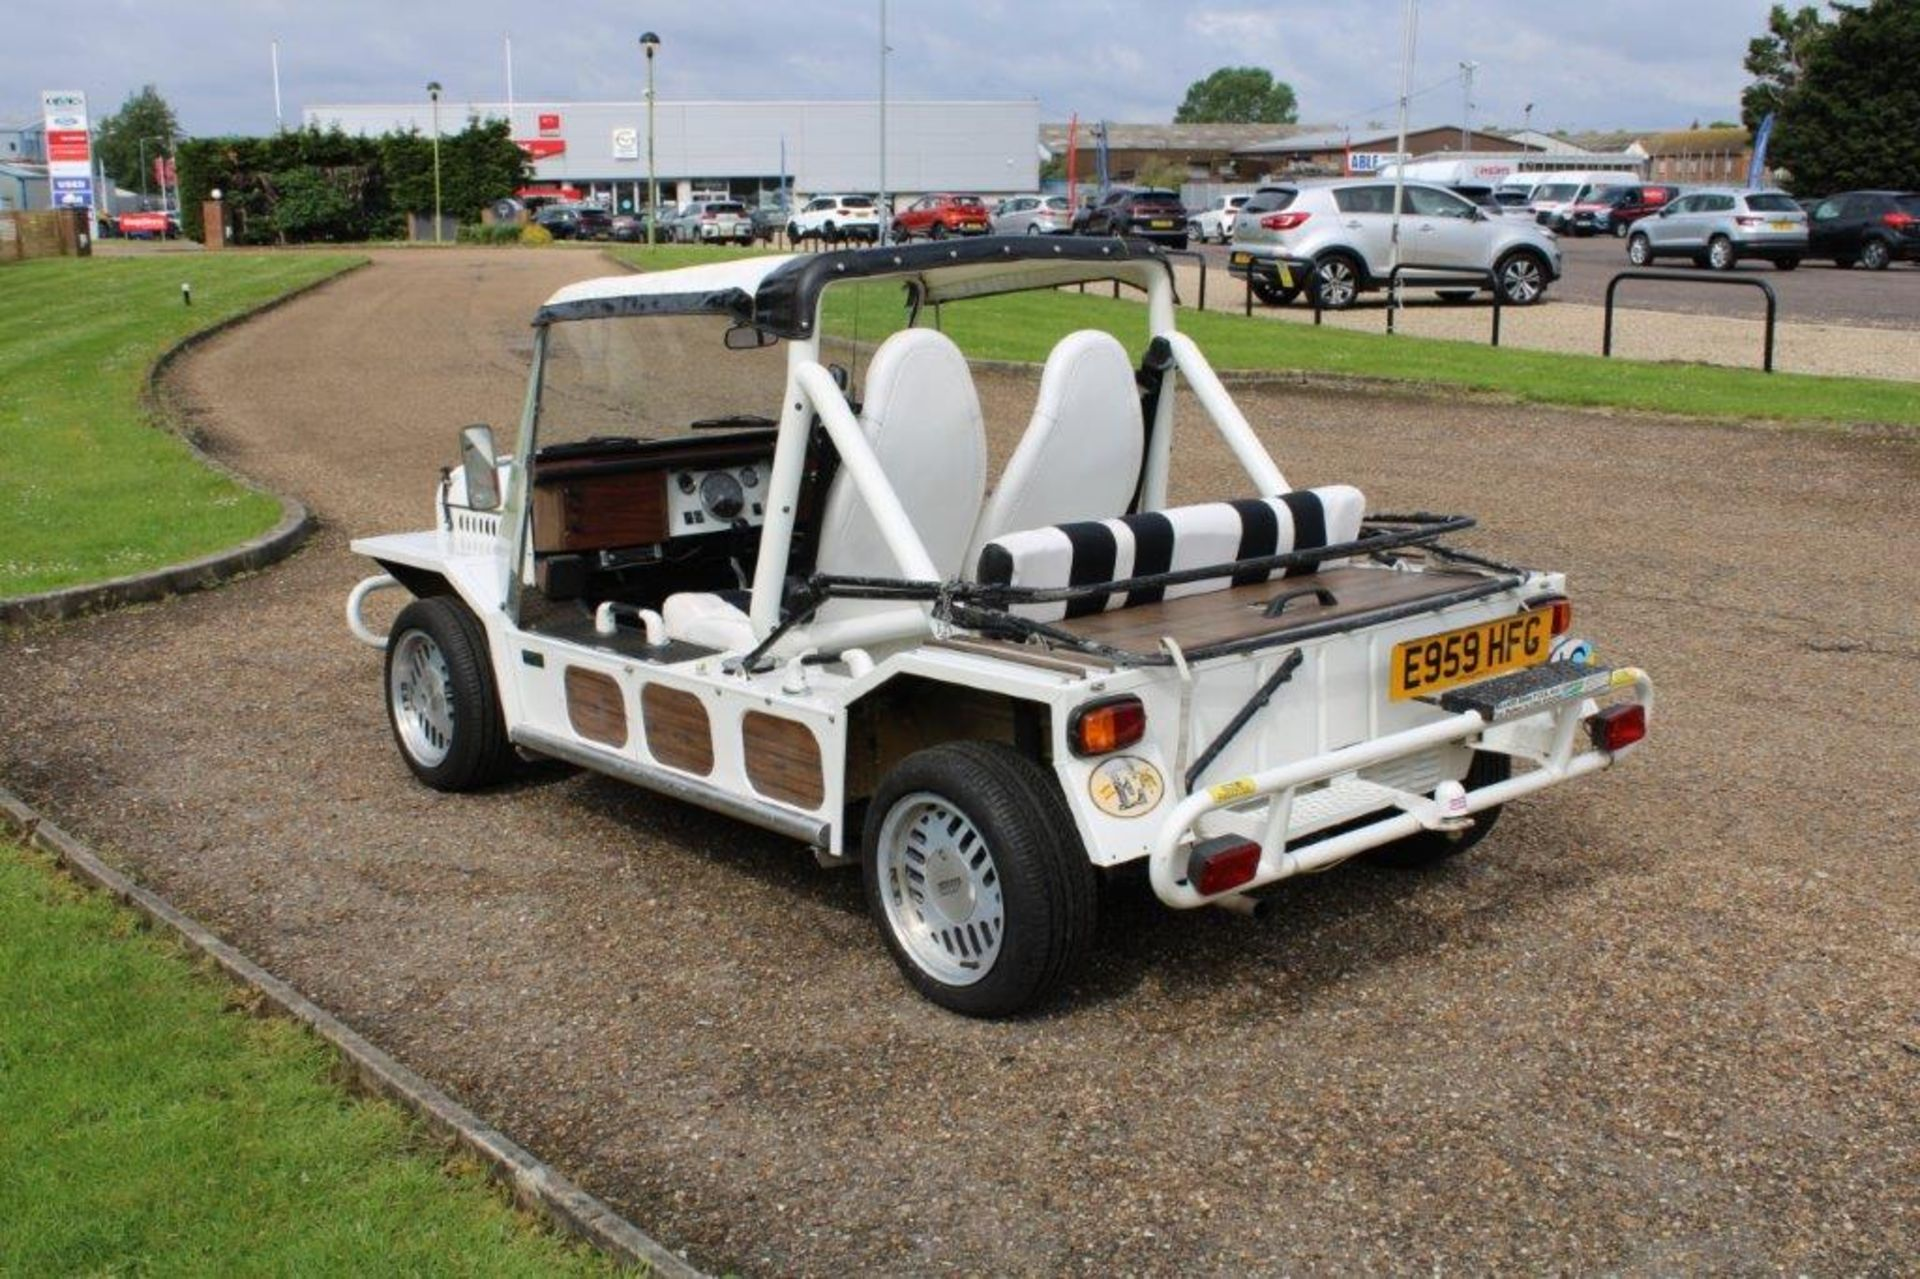 1988 Austin Rover Mini Moke - Image 4 of 22